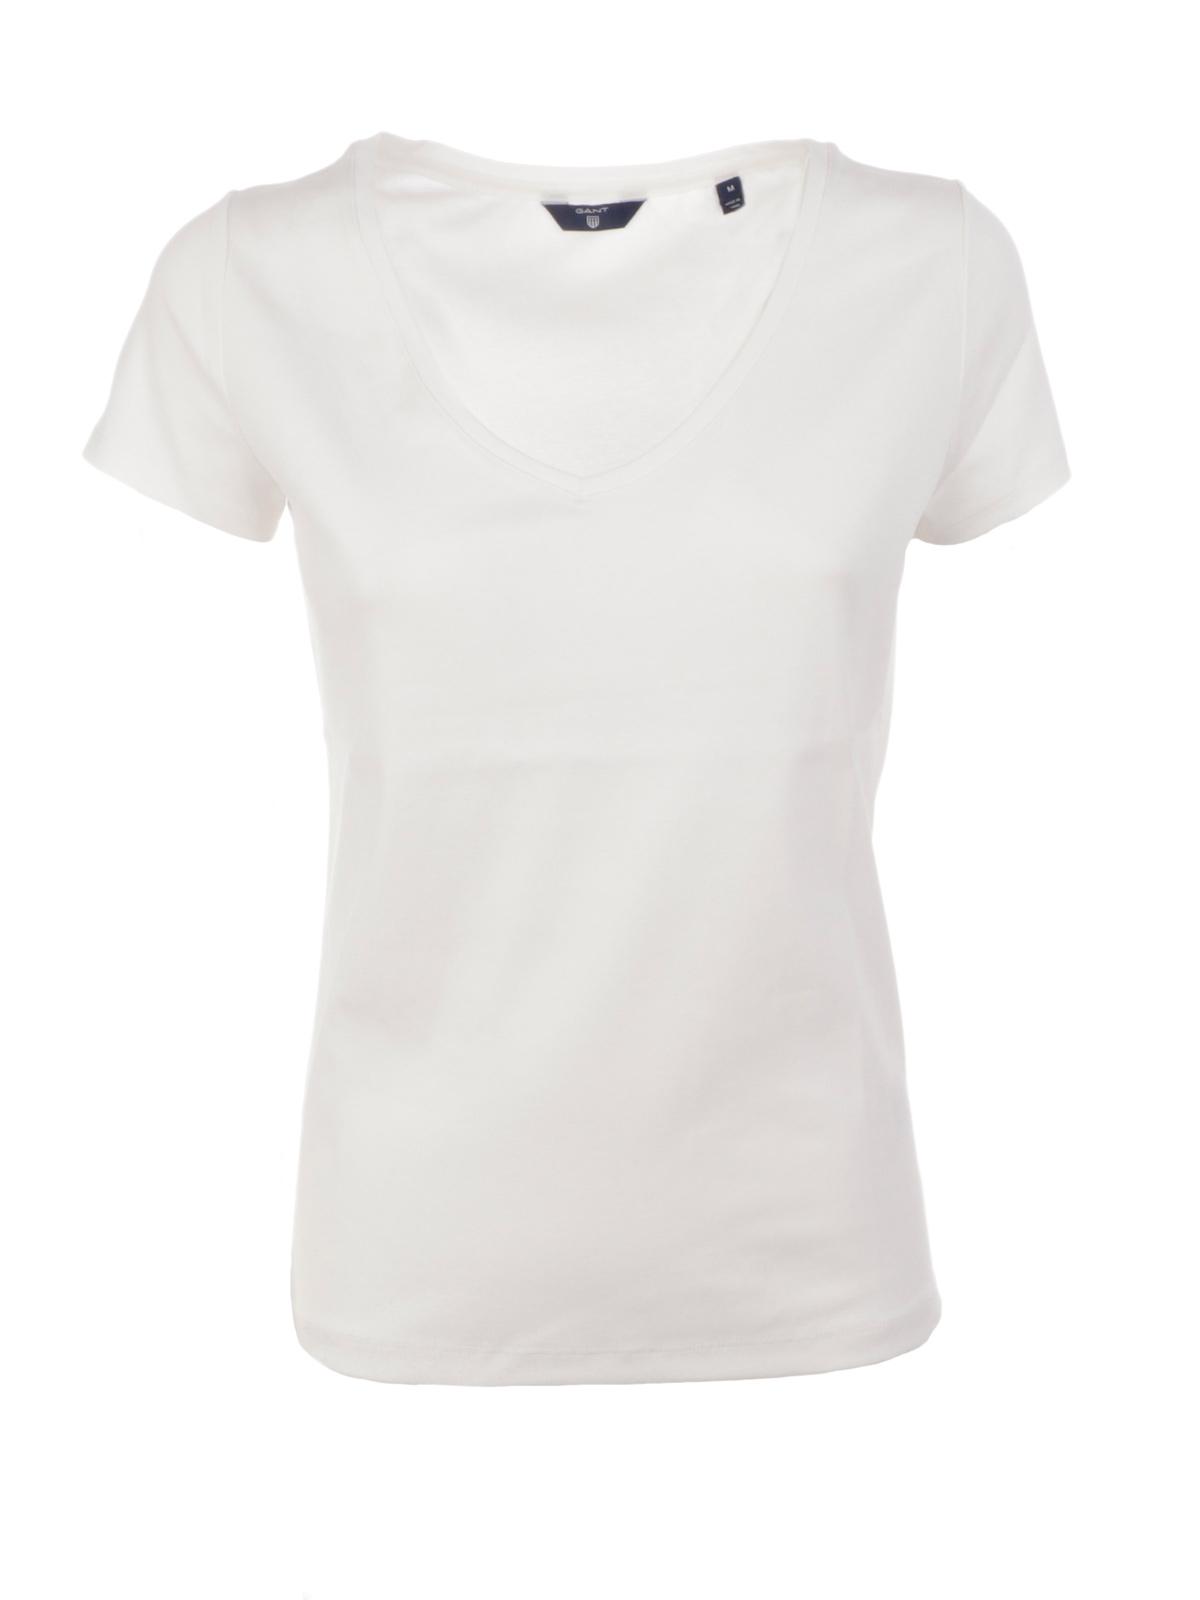 Immagine di GANT | T-Shirt Donna Elasticizzata